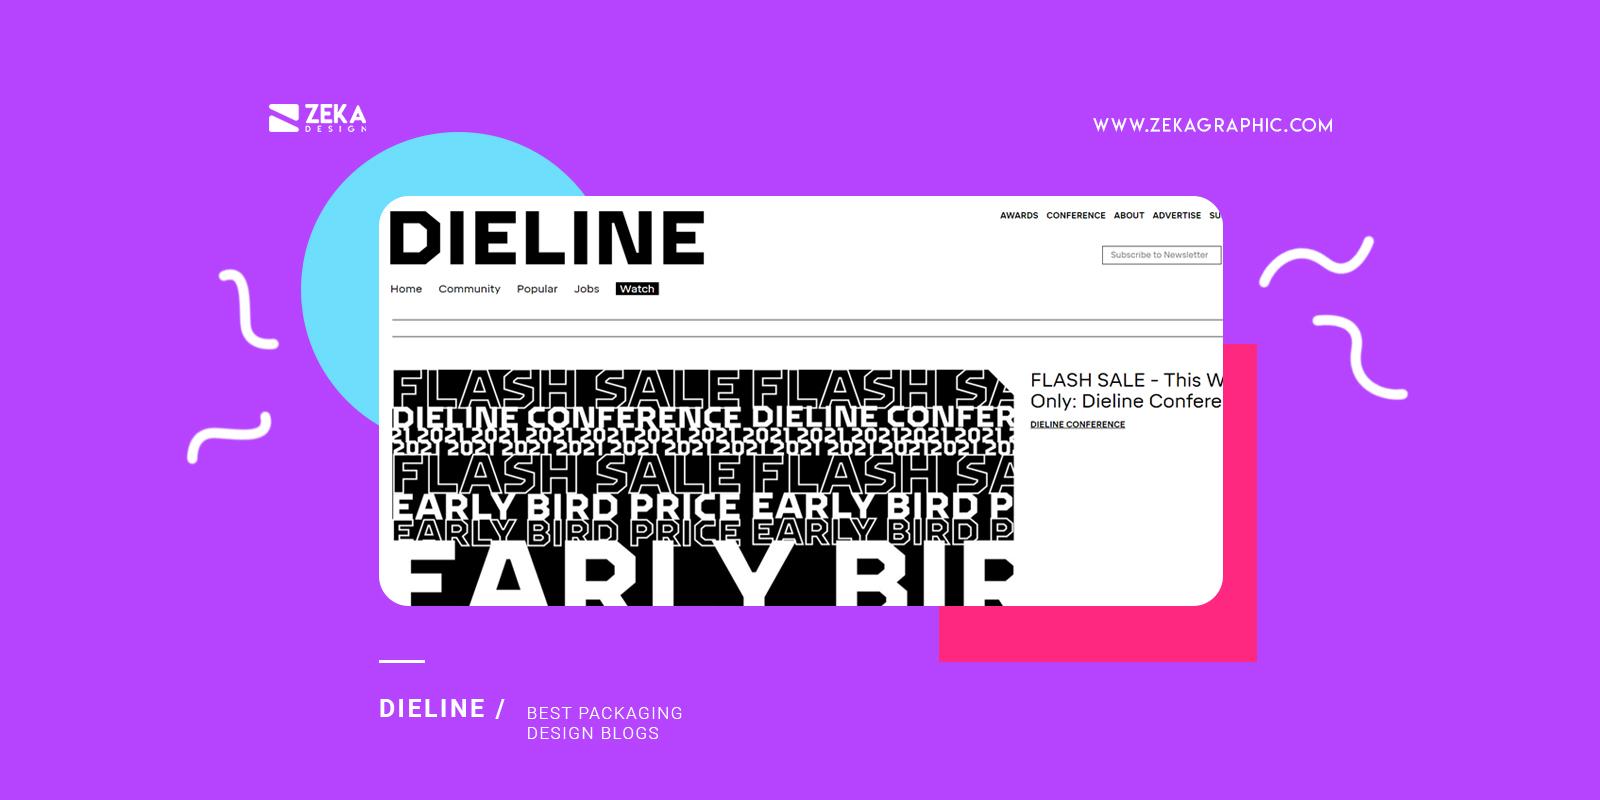 dieline Best Packaging Design Blogs